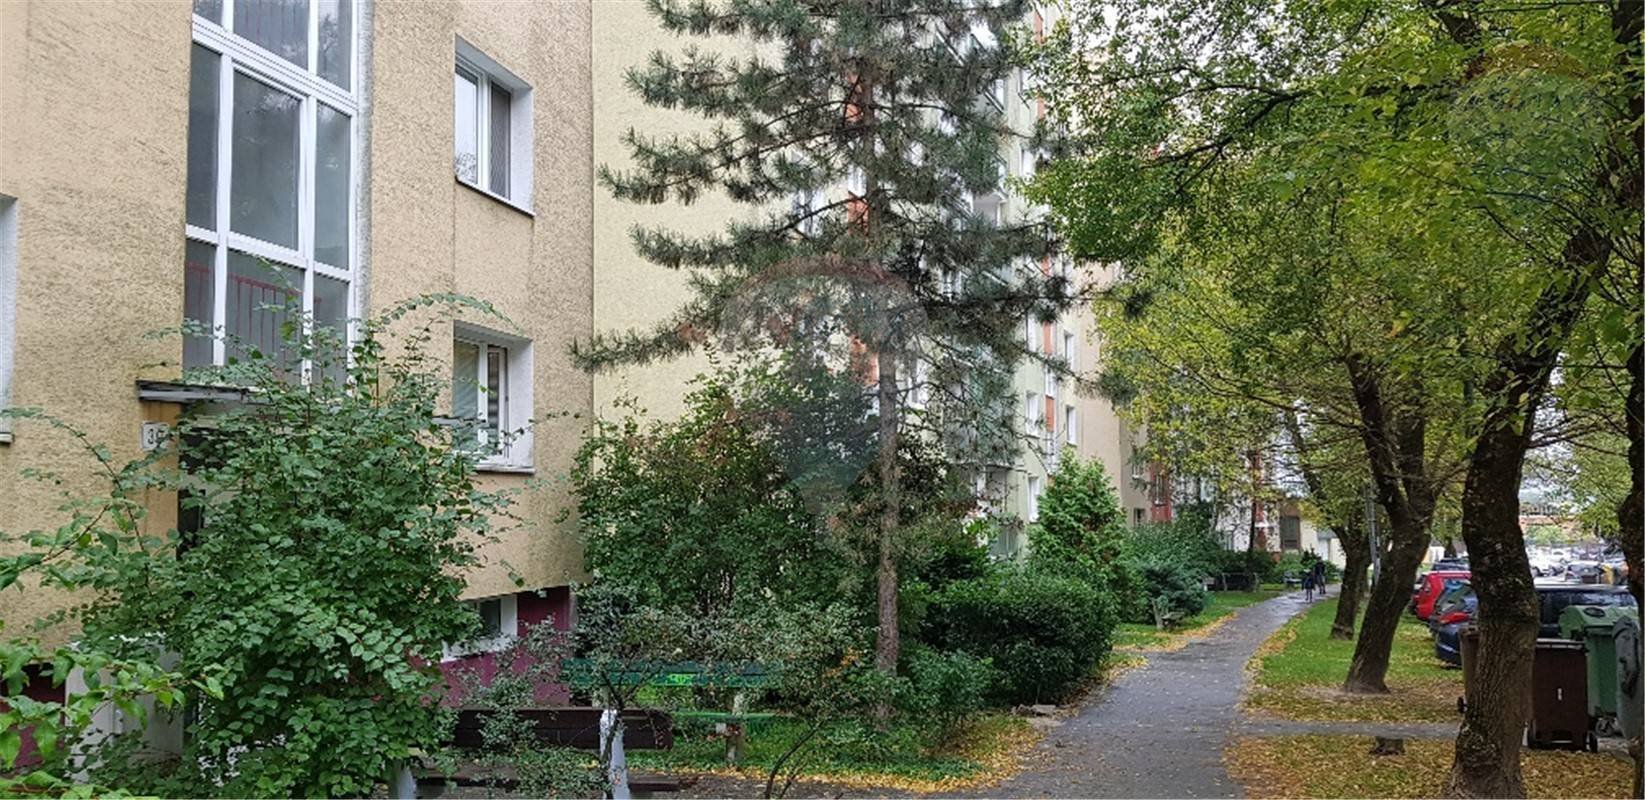 Predaj 1-izb. byt - 43 m2 - Lamač - Studenohorská ul.